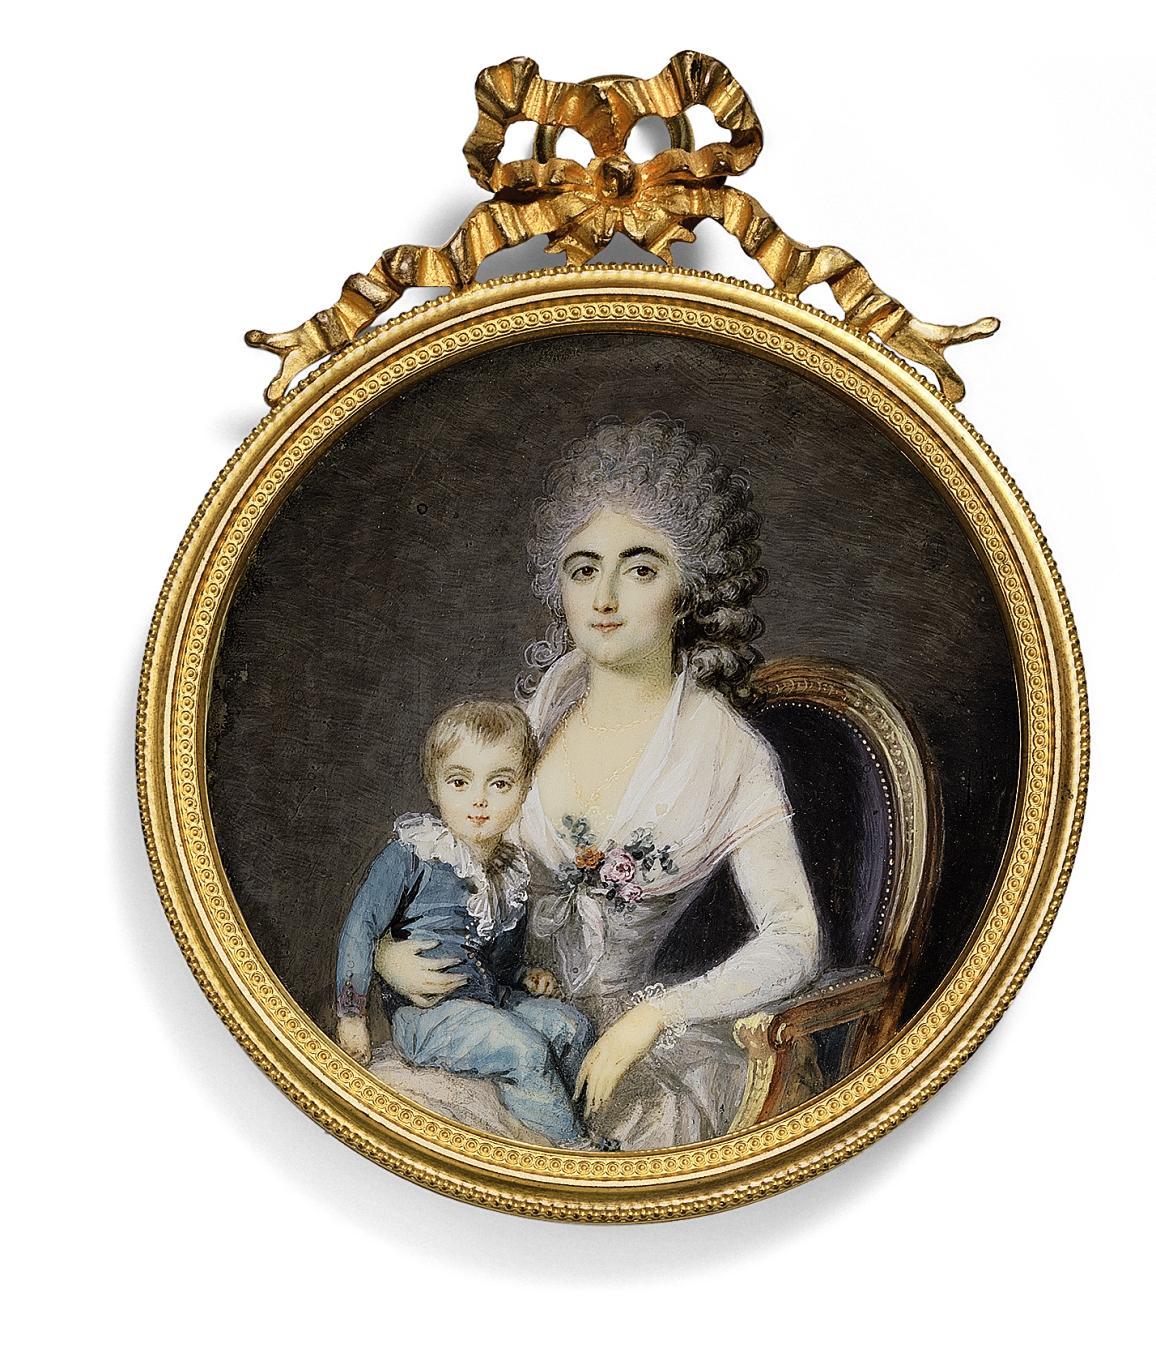 JEAN-URBAIN GUERIN (FRENCH, 1760-1836)